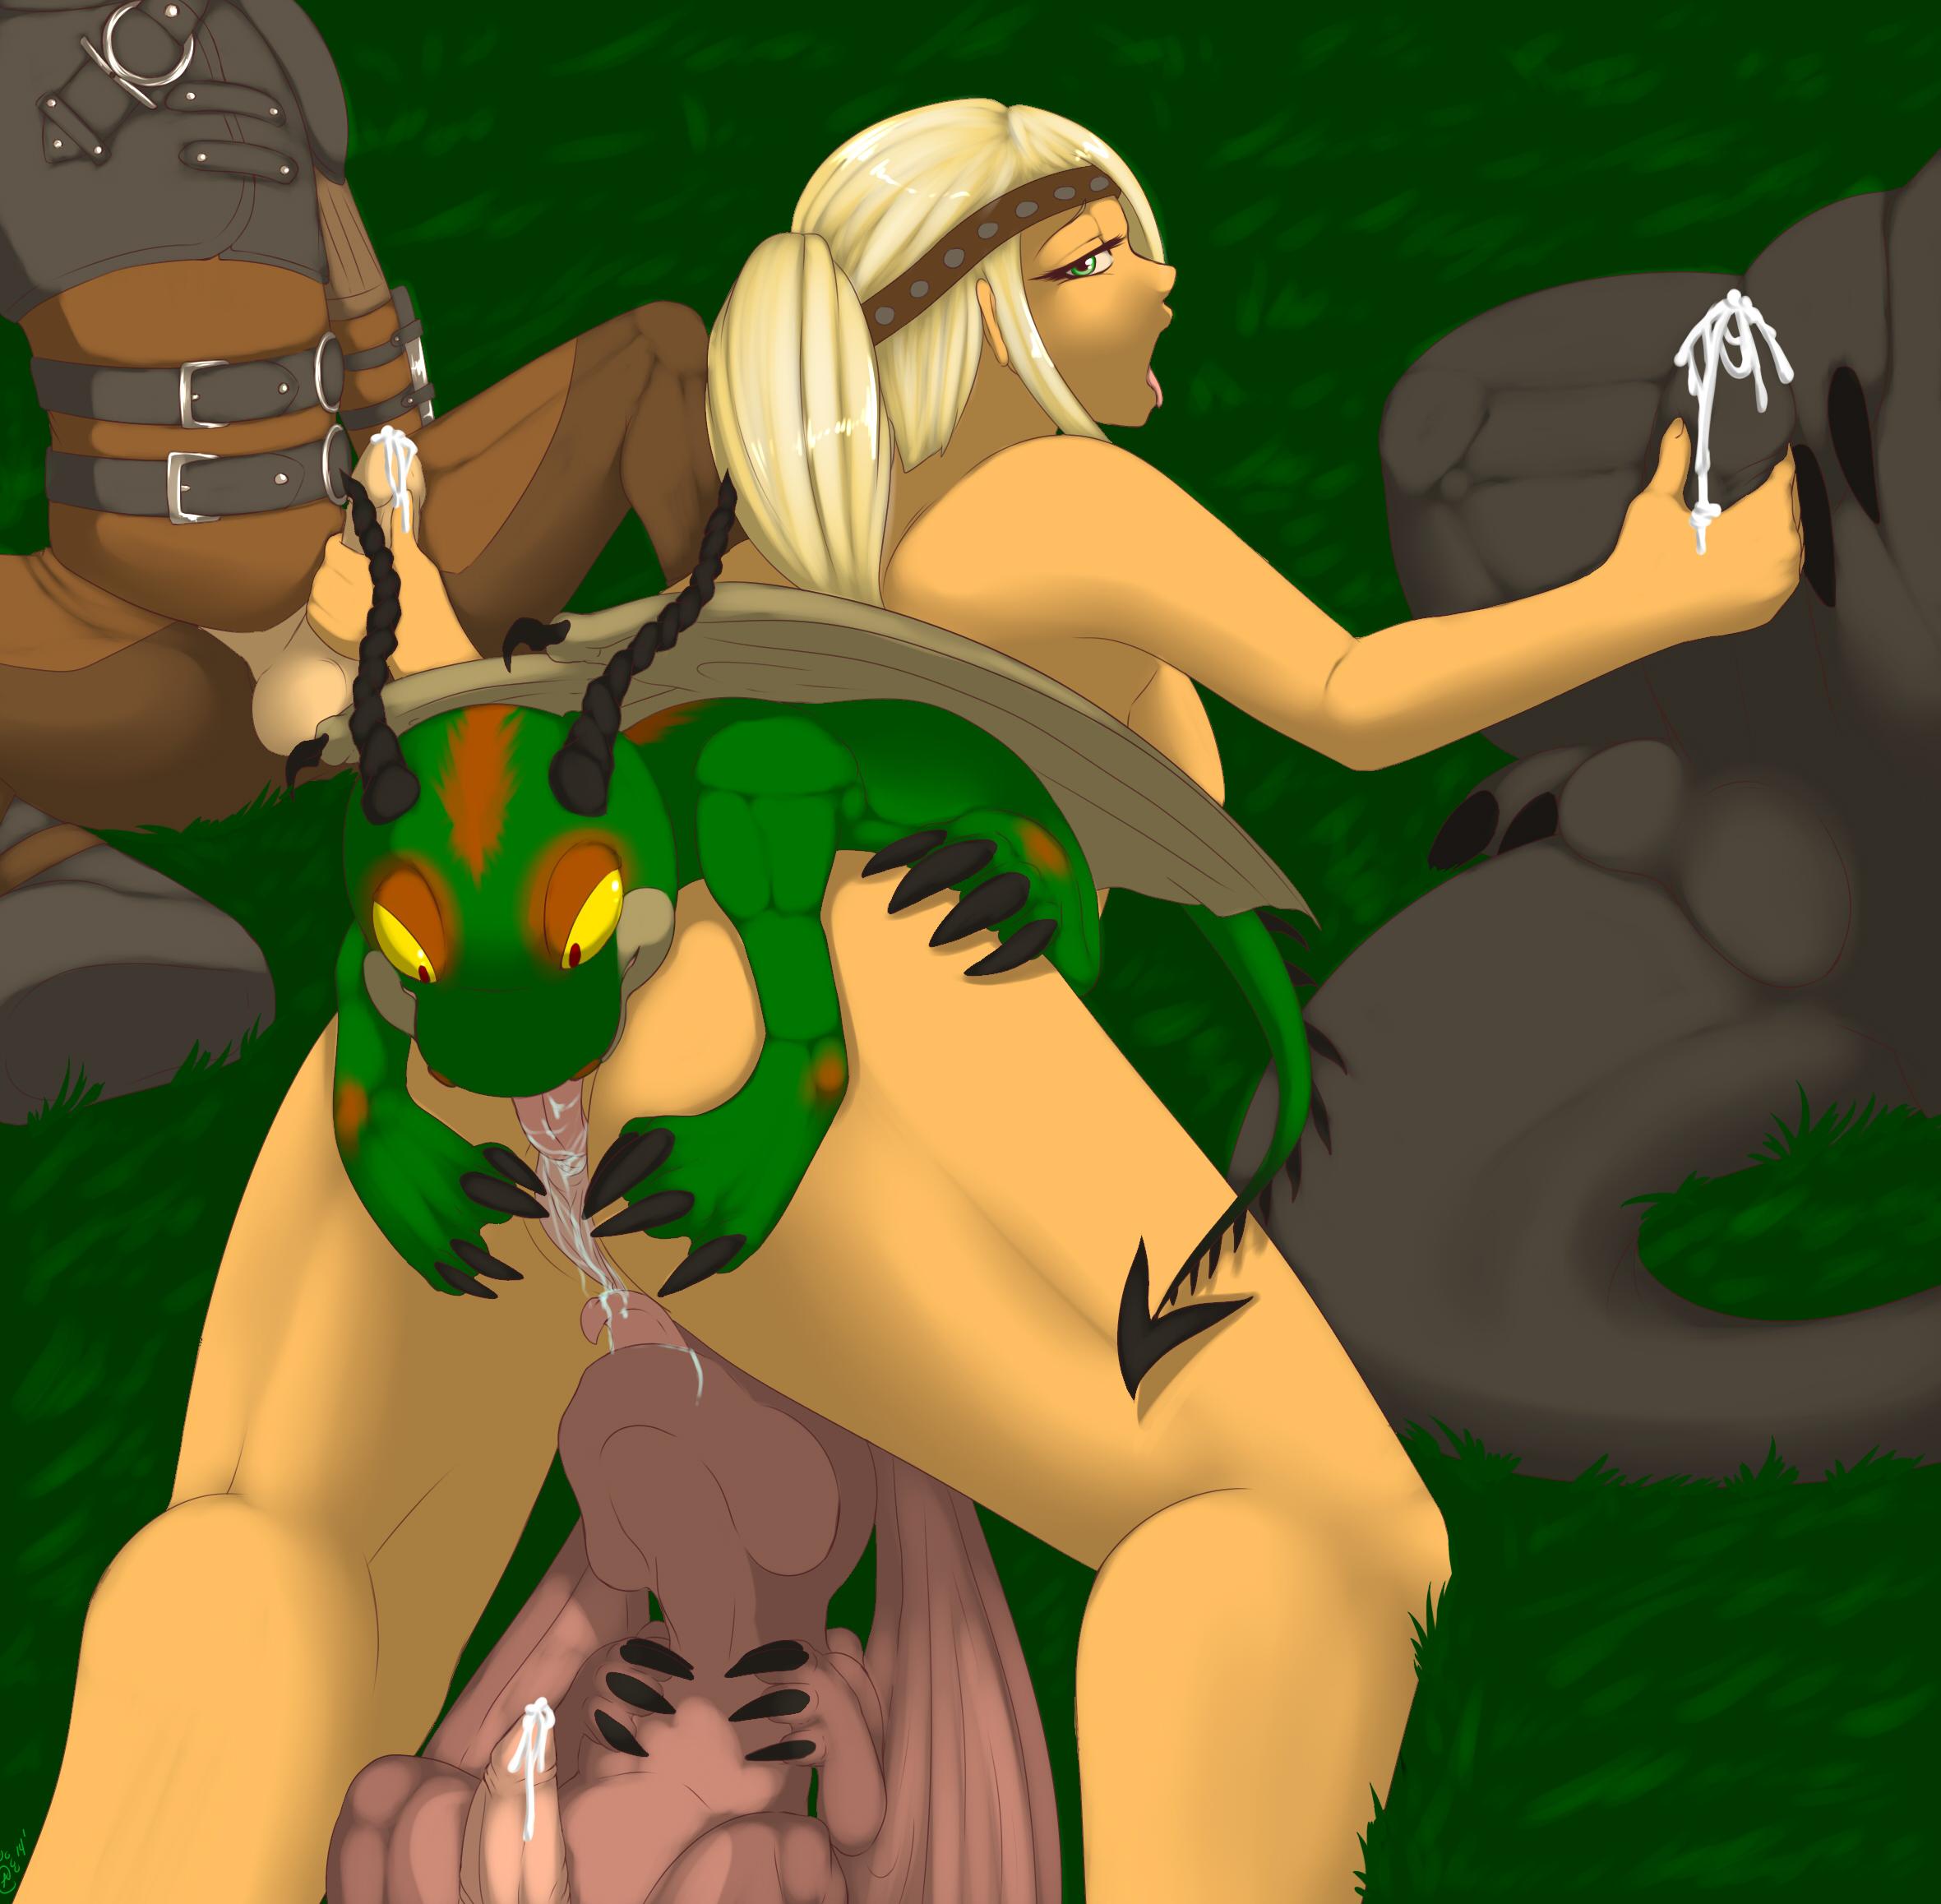 Секс марио и дракон 11 фотография